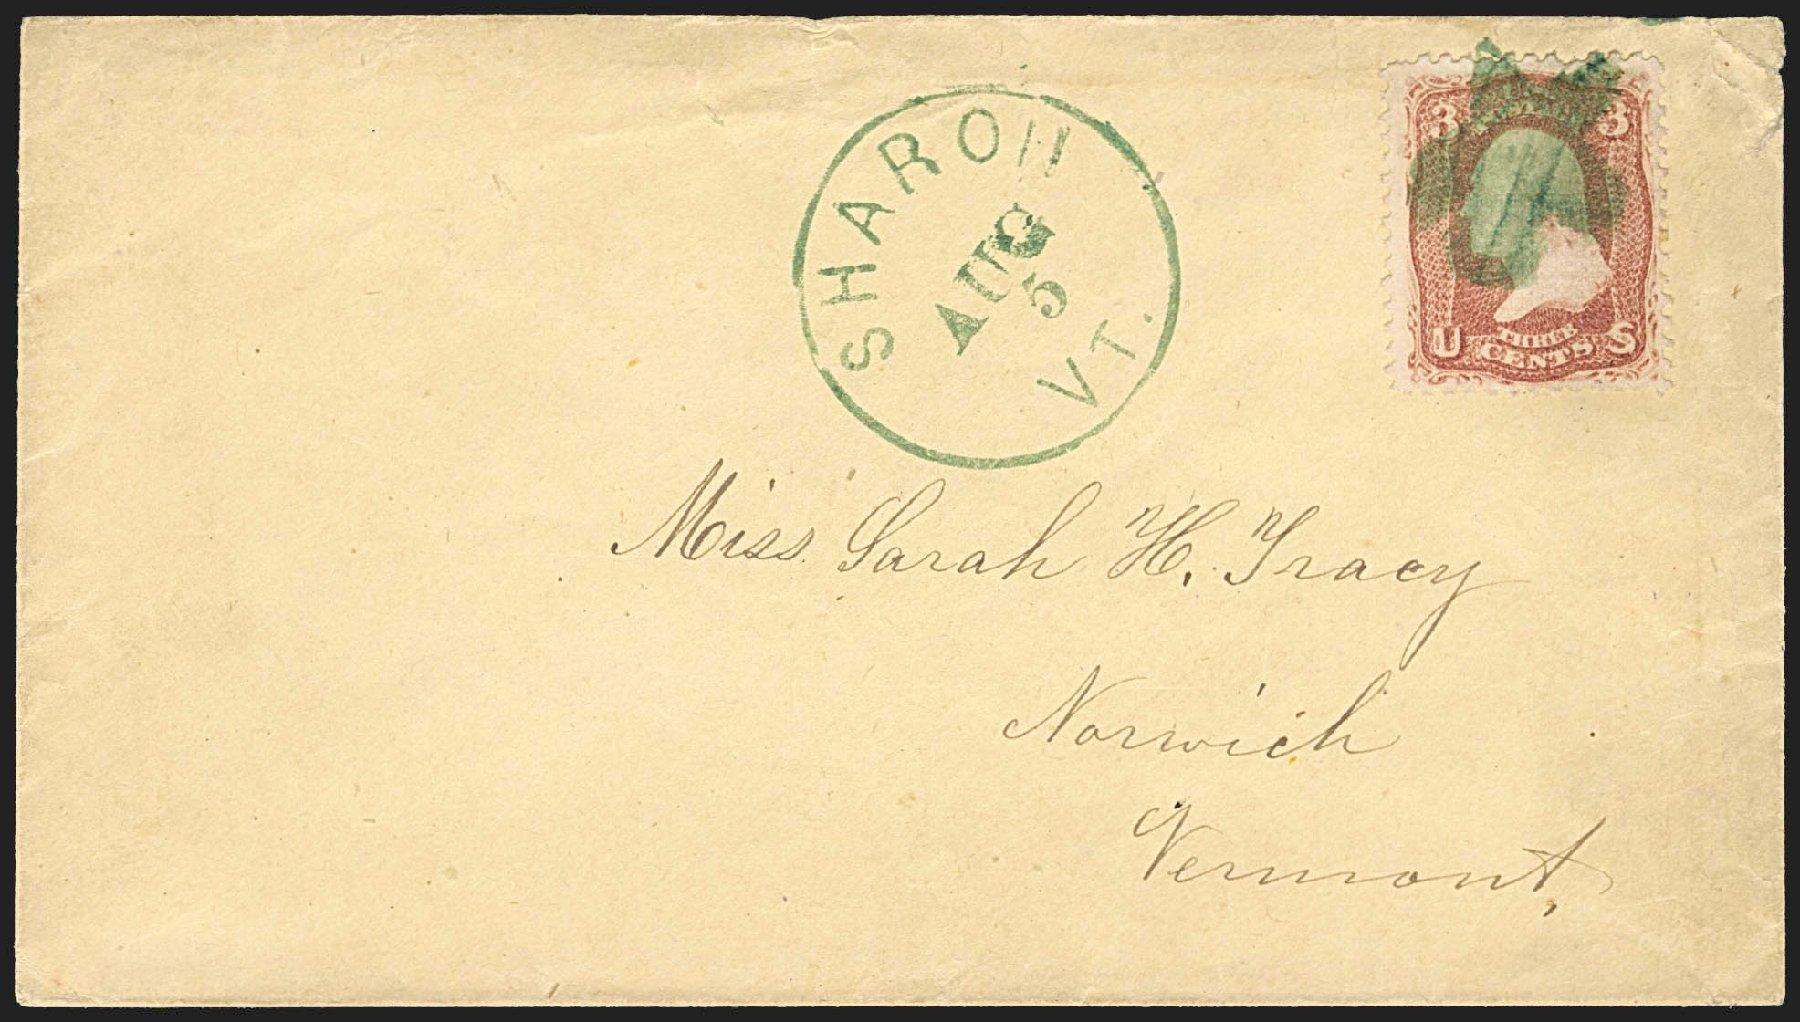 US Stamp Values Scott Catalog 88 - 1868 3c Washington Grill. Robert Siegel Auction Galleries, Jul 2015, Sale 1107, Lot 174